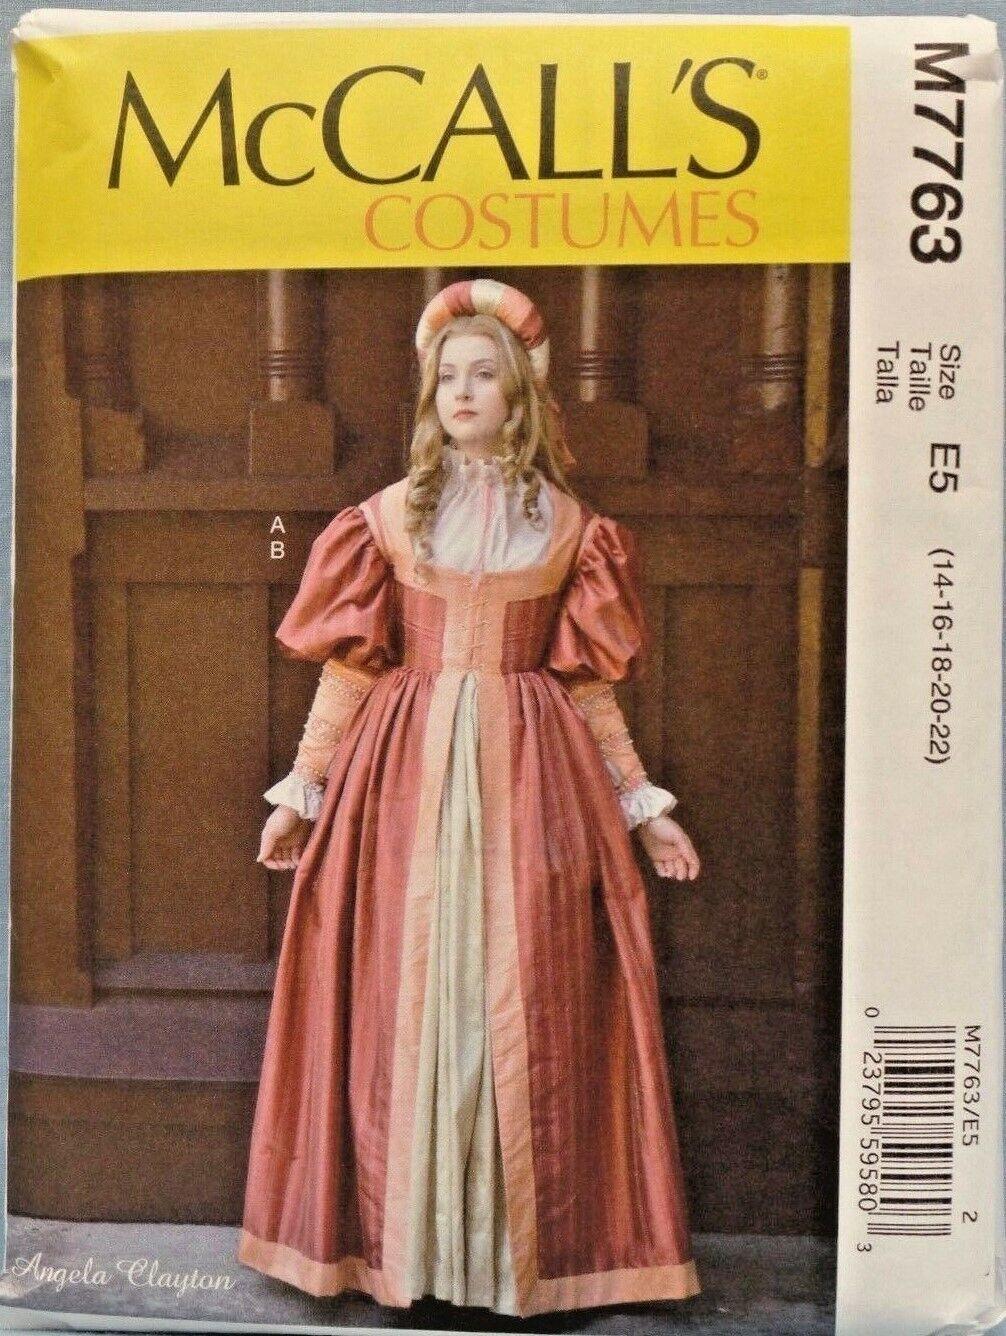 14-16-18-20-22 McCalls Sewing Pattern 7988 Costumes Dresses E5